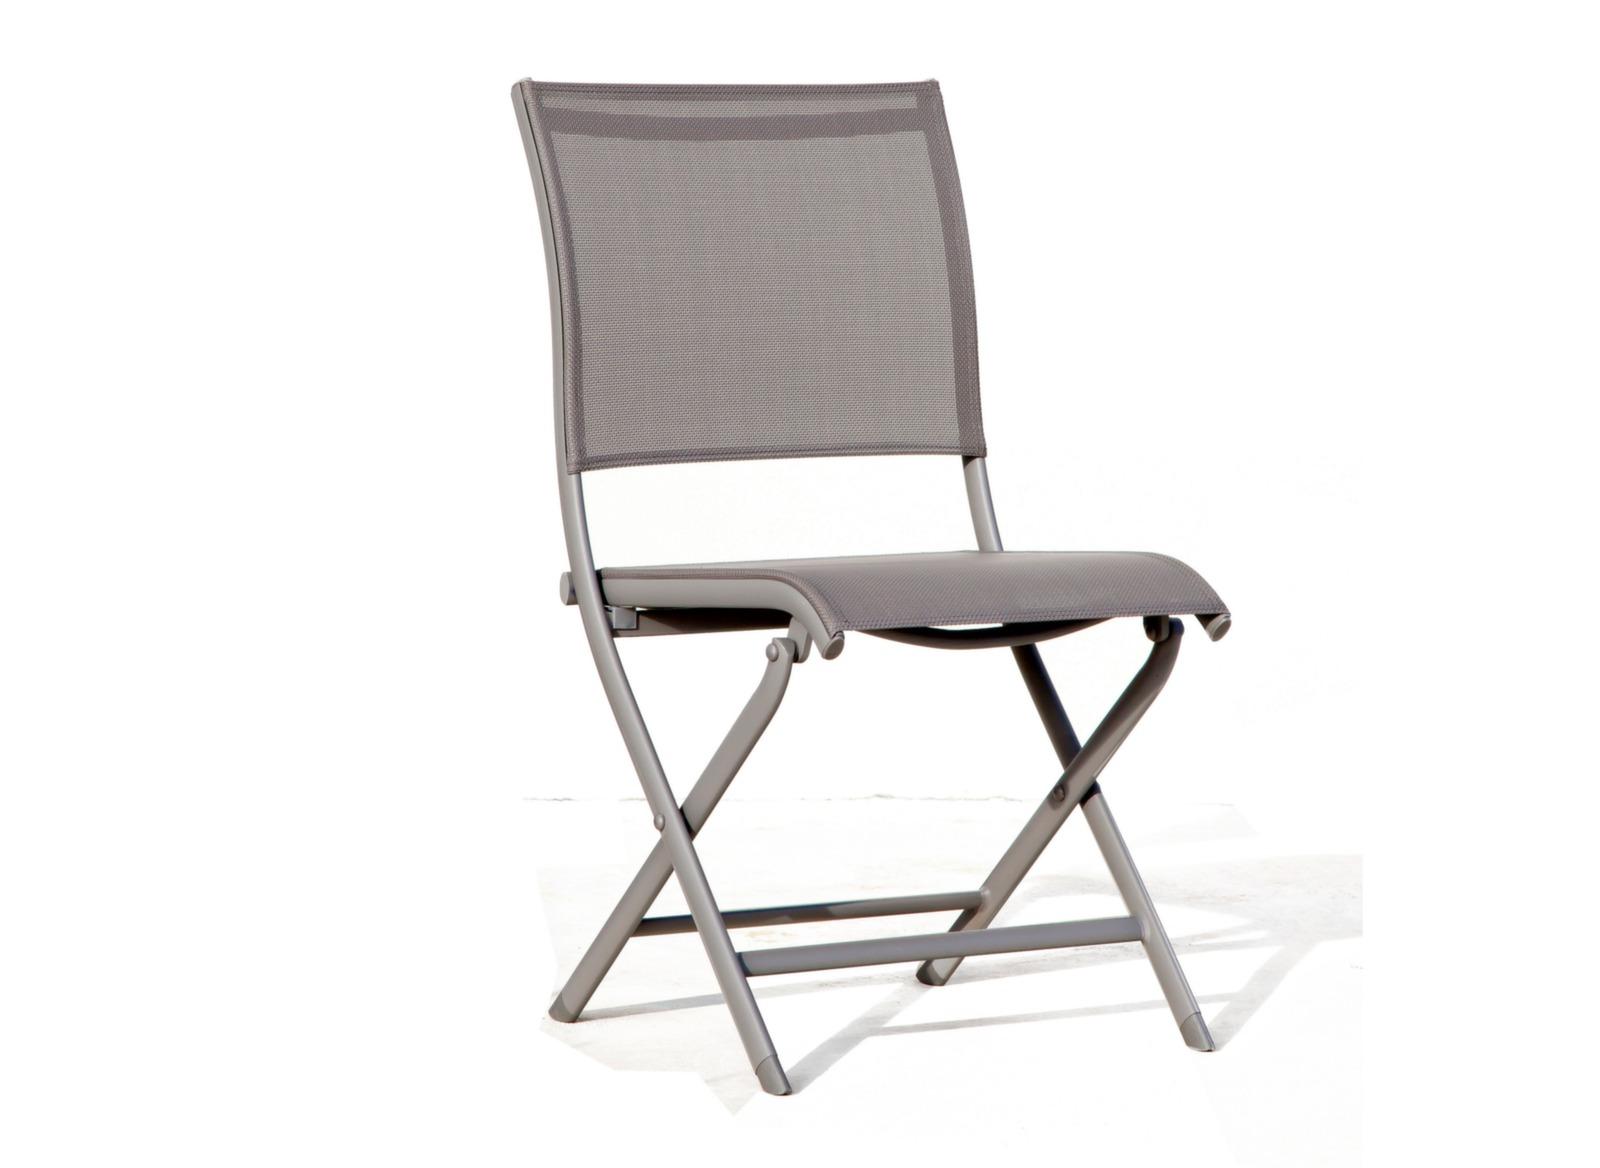 chaise pliante toile latest chaise bois pliante chaise pliante bois samba chaise bois pliante. Black Bedroom Furniture Sets. Home Design Ideas